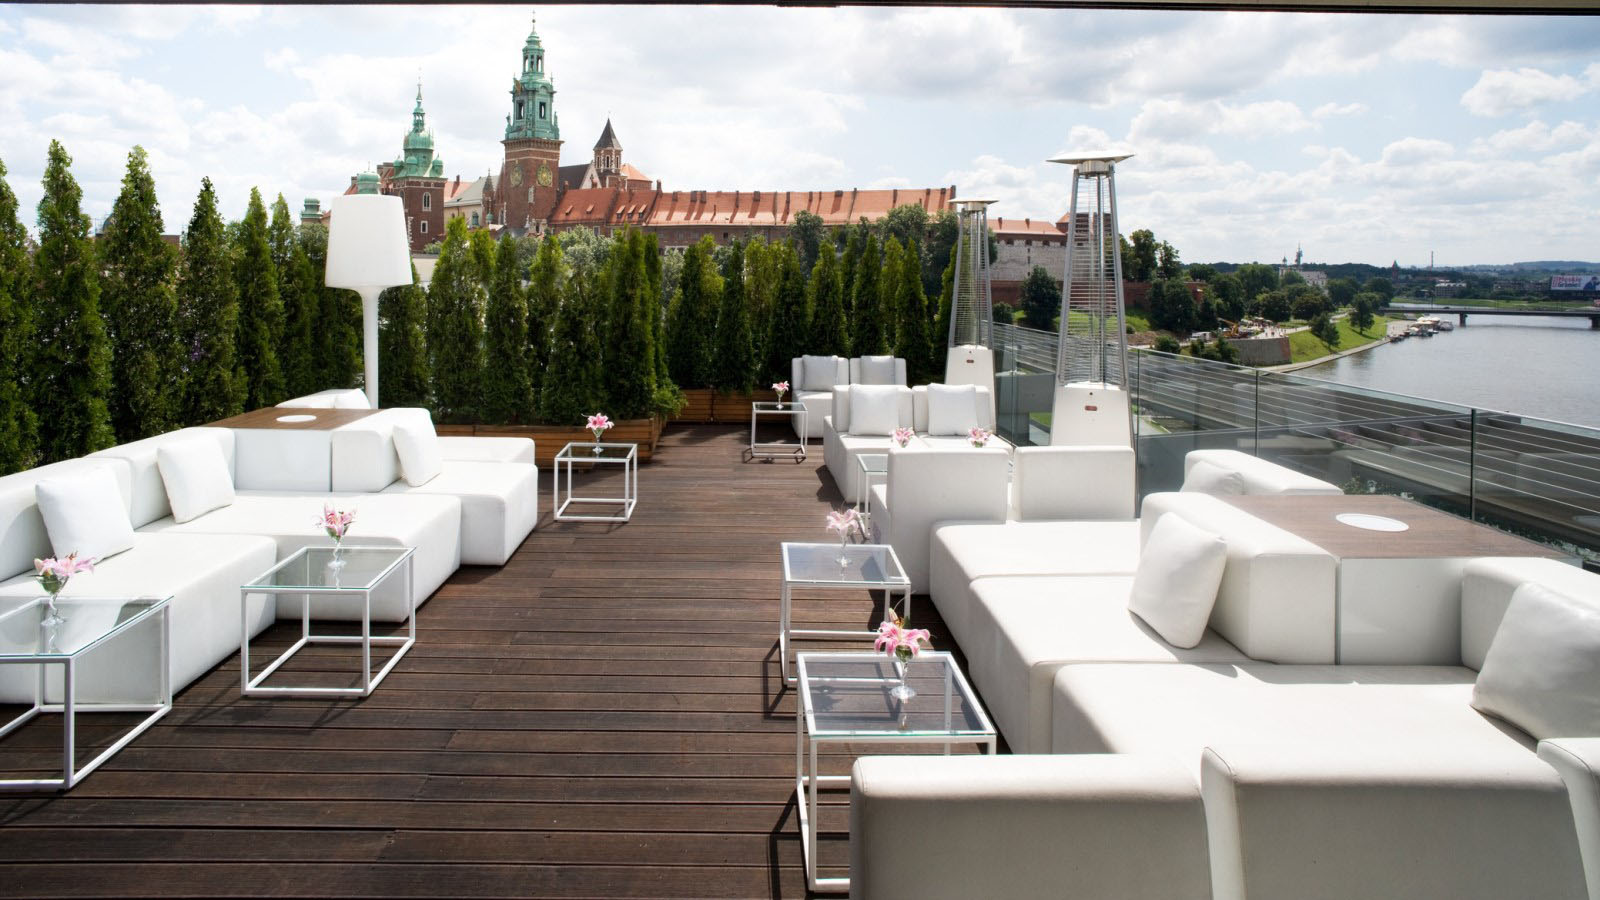 De 15 mooiste hotelterrassen ter wereld misset horeca for Meilleur site pour hotel